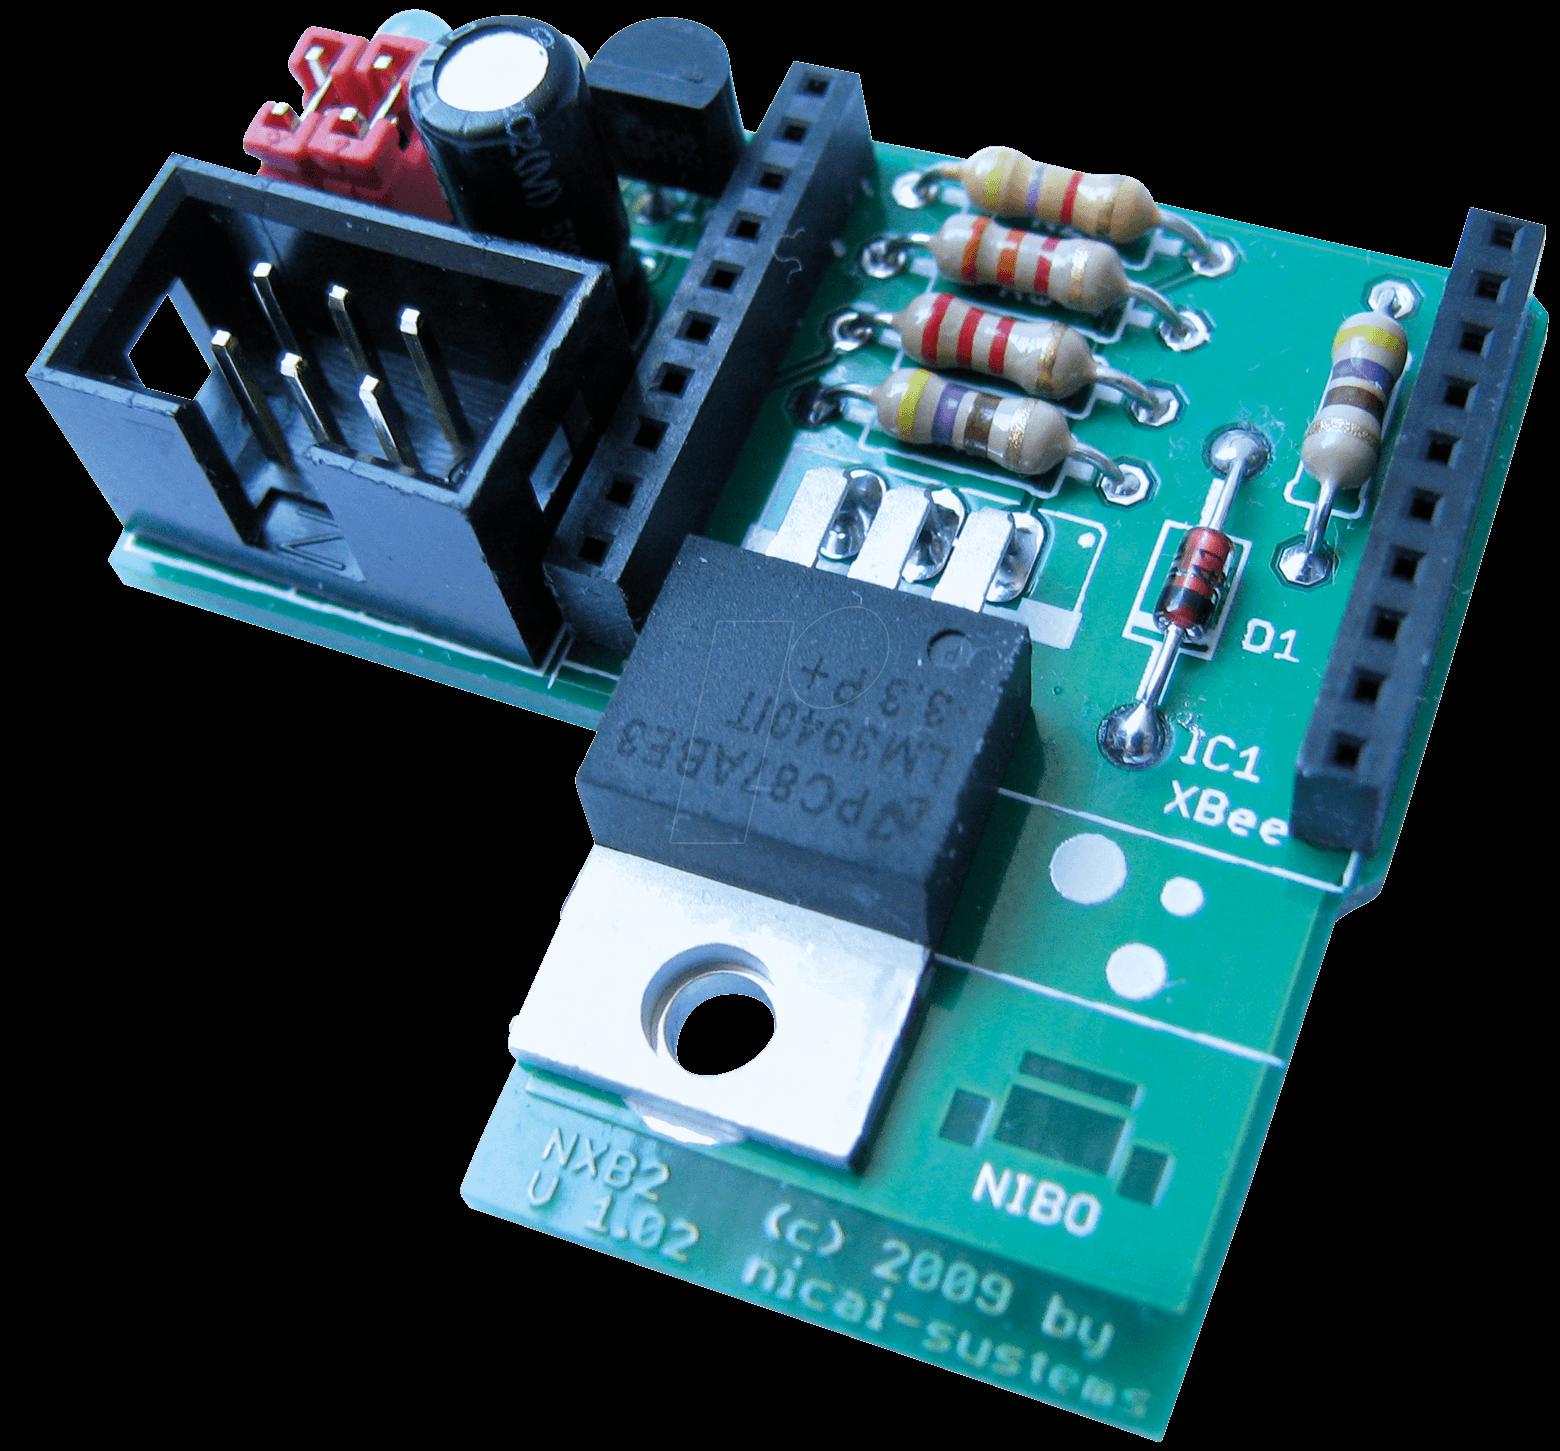 NIBO NXB2 - NXB2 Adapterplatine für Anschluss XBEE